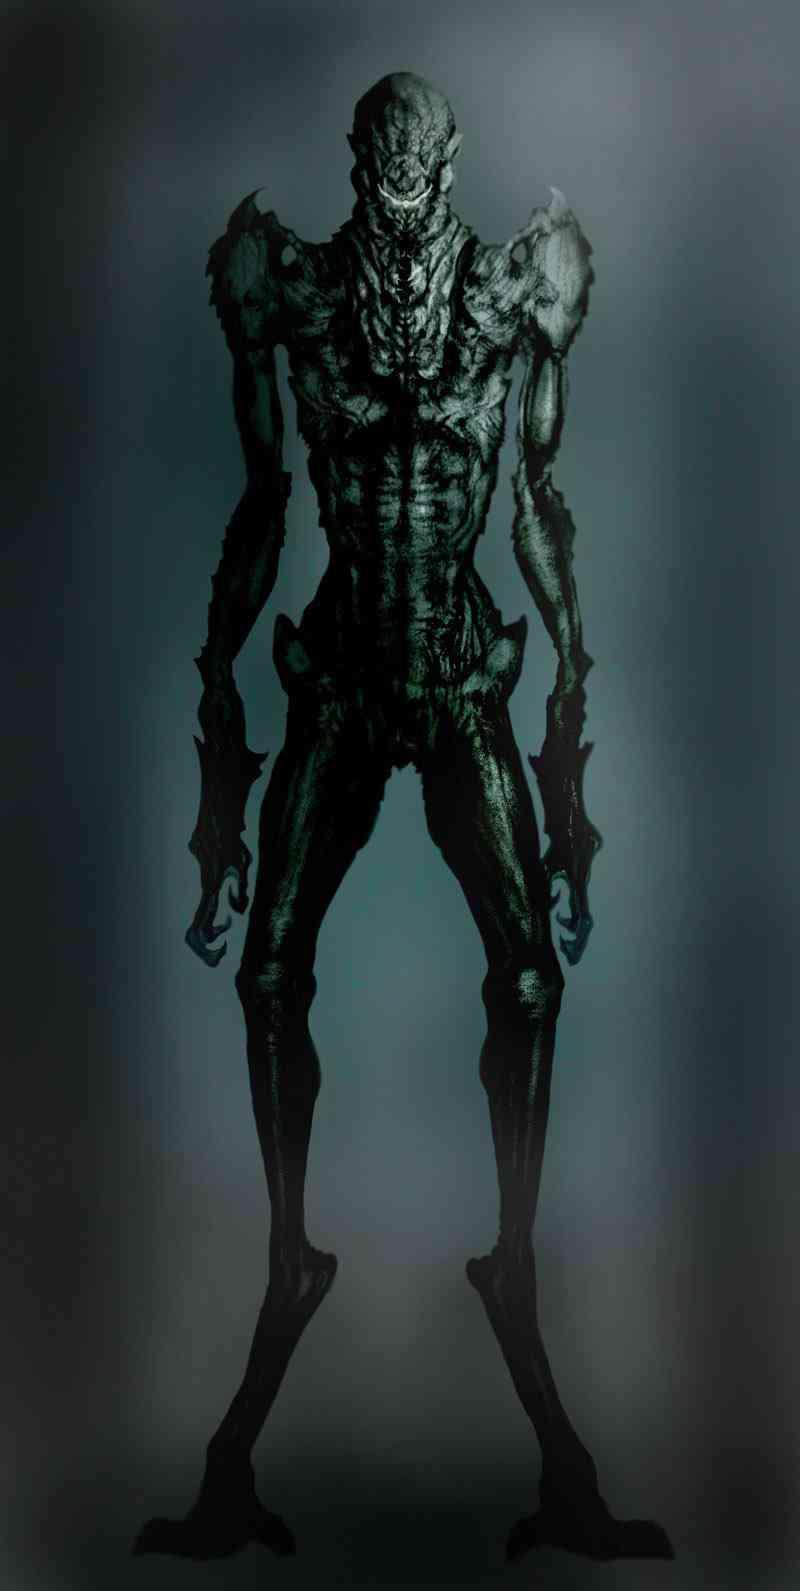 alien design 5 post vrsion Ultra gump blaster mega pack ultimate post de monstros 6